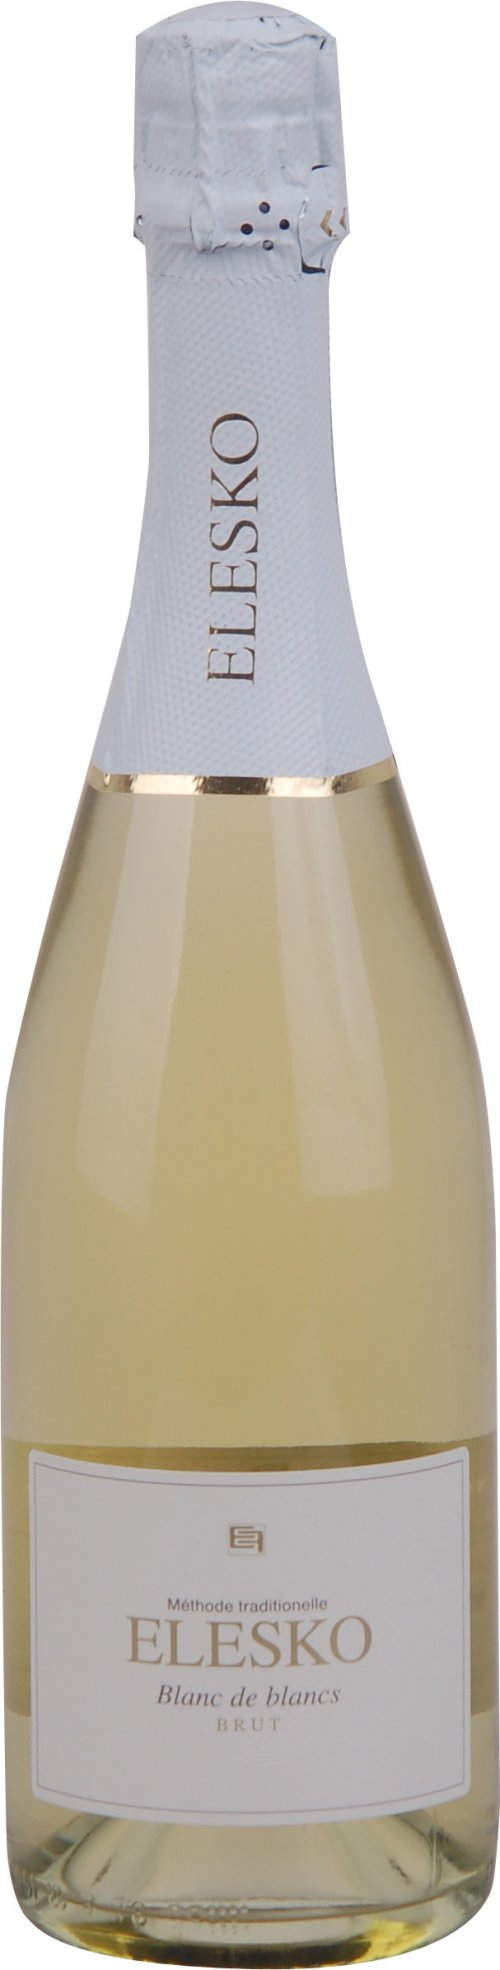 Elesko Sekt Blanc de Blancs Chardonnay 0,75L, skt trm, bl, brut